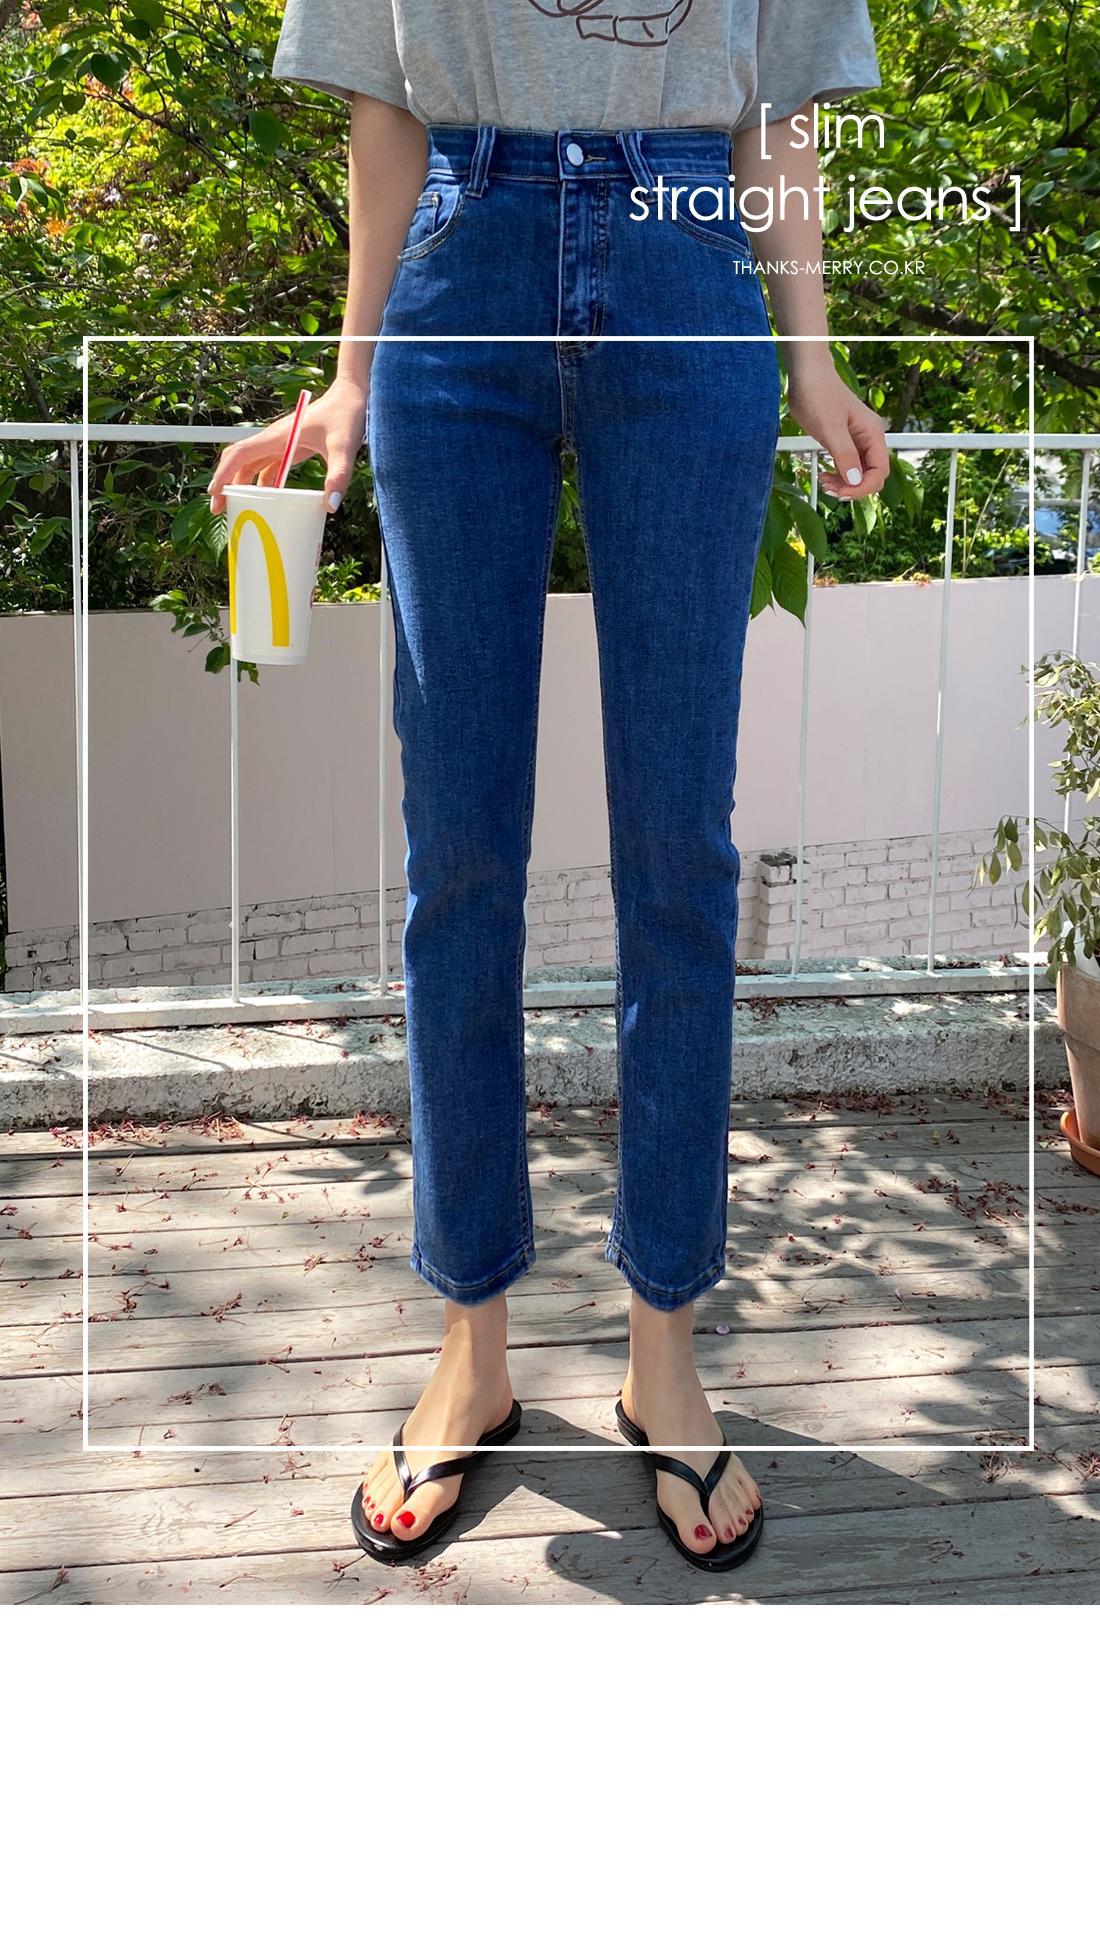 Lunch Socks Band Dark Blue Slim Date Jeans